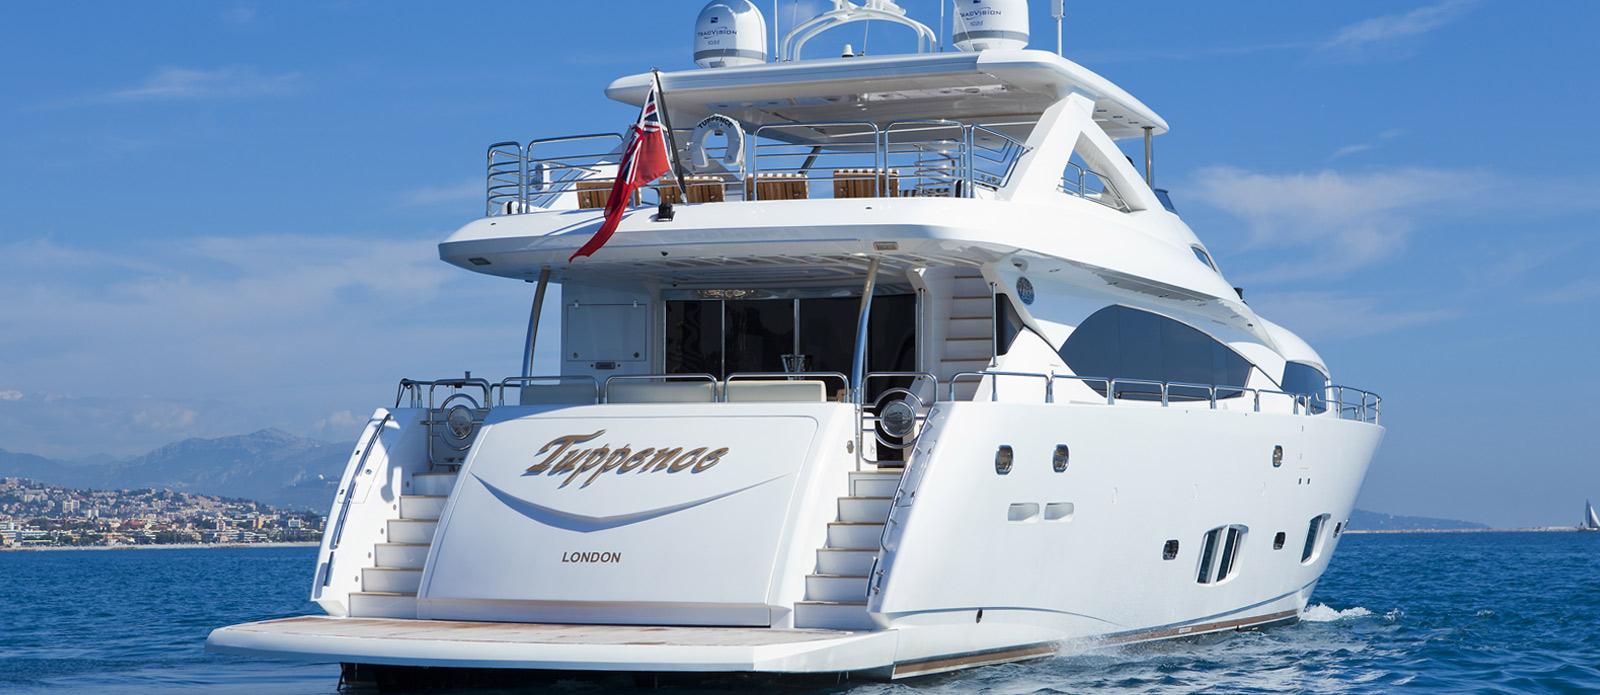 Sunseeker-30-Metre-Yacht-Tuppence-Stern-View-2